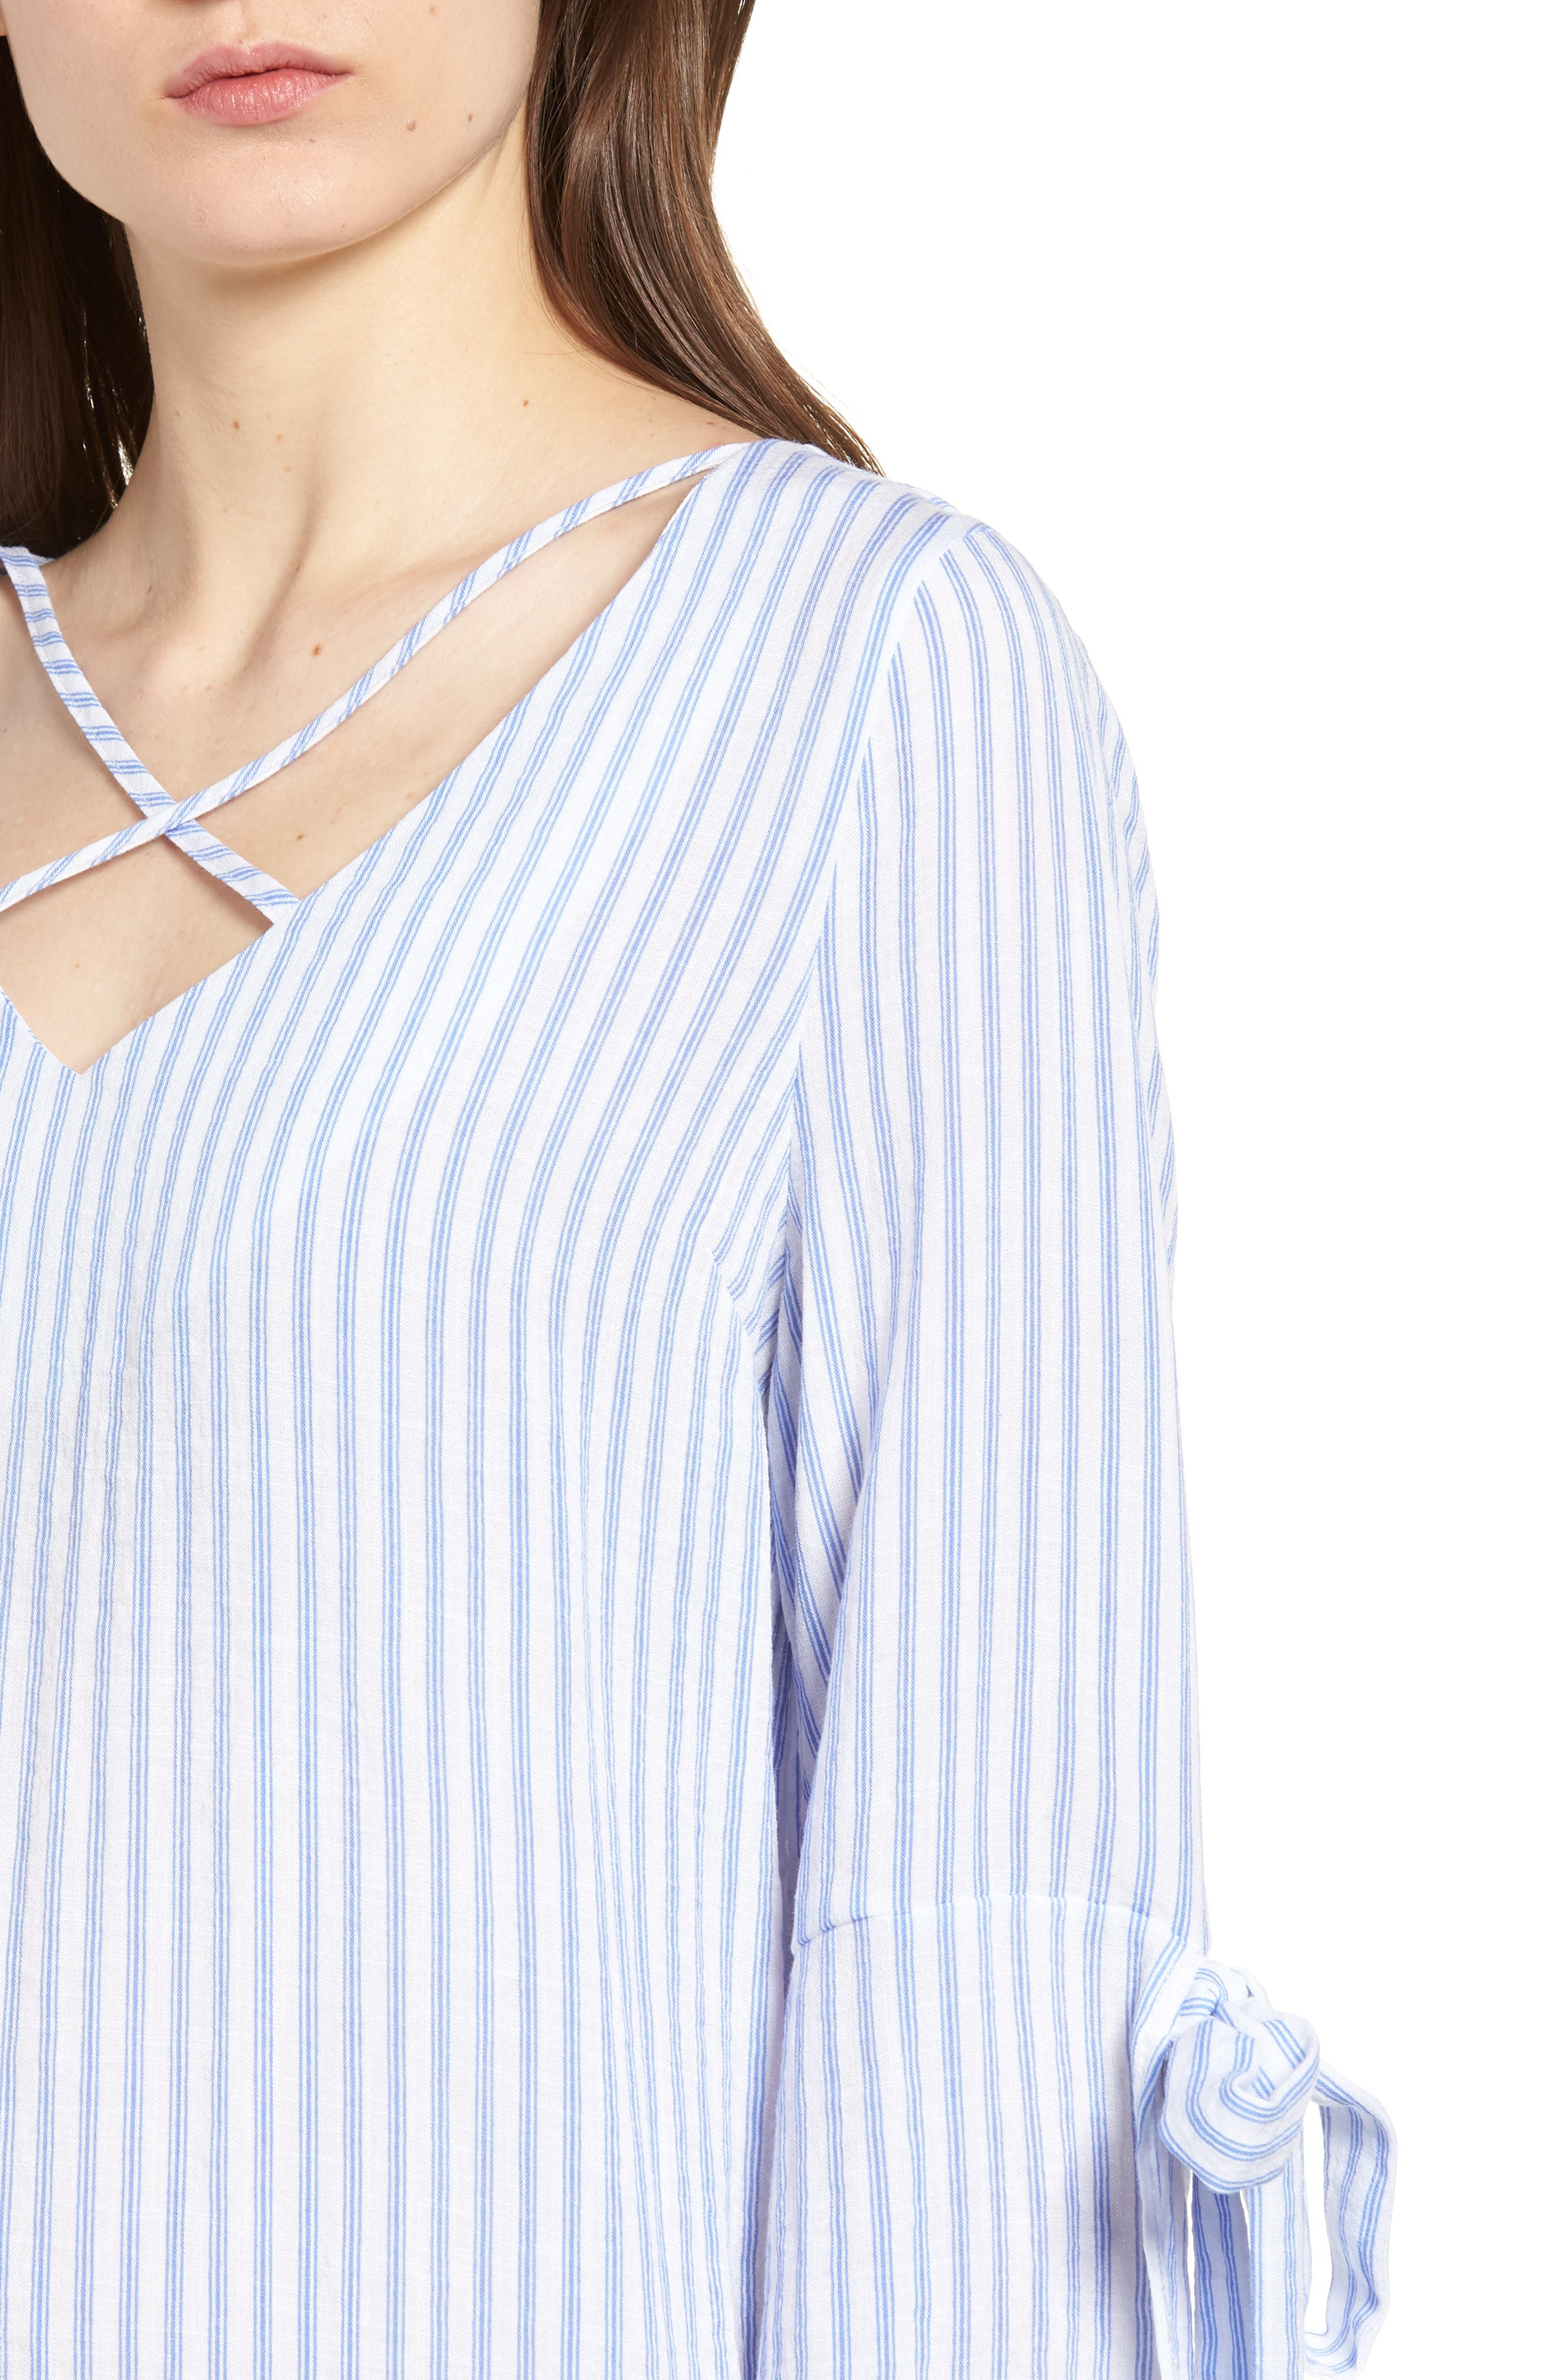 Bishop + Young Stripe Tunic Top,                             Alternate thumbnail 4, color,                             Blue White Stripe